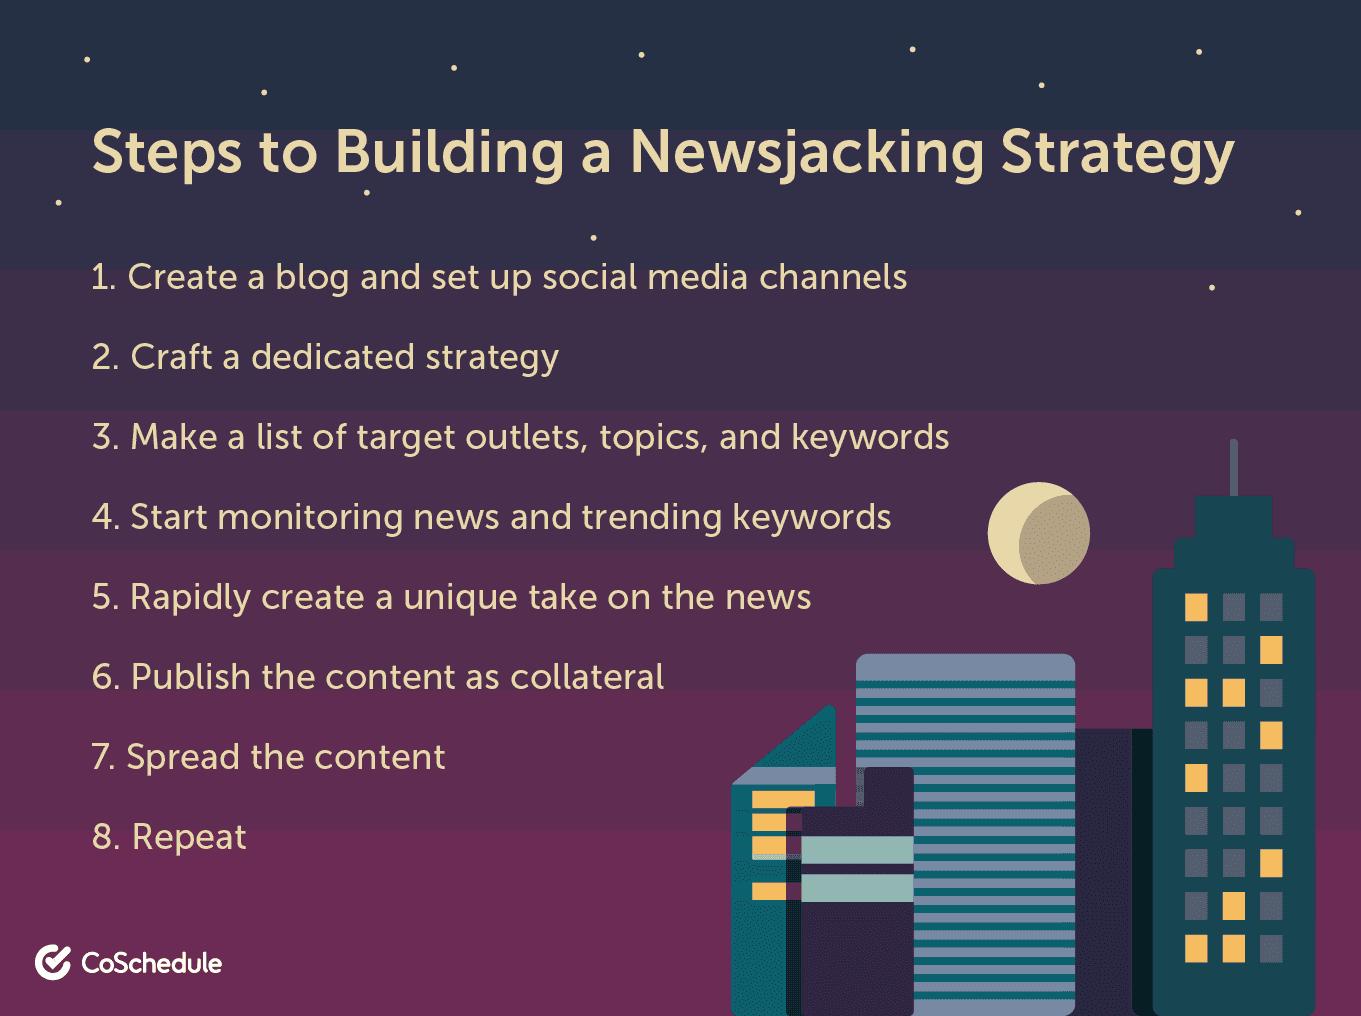 Steps to build a newsjacking strategy